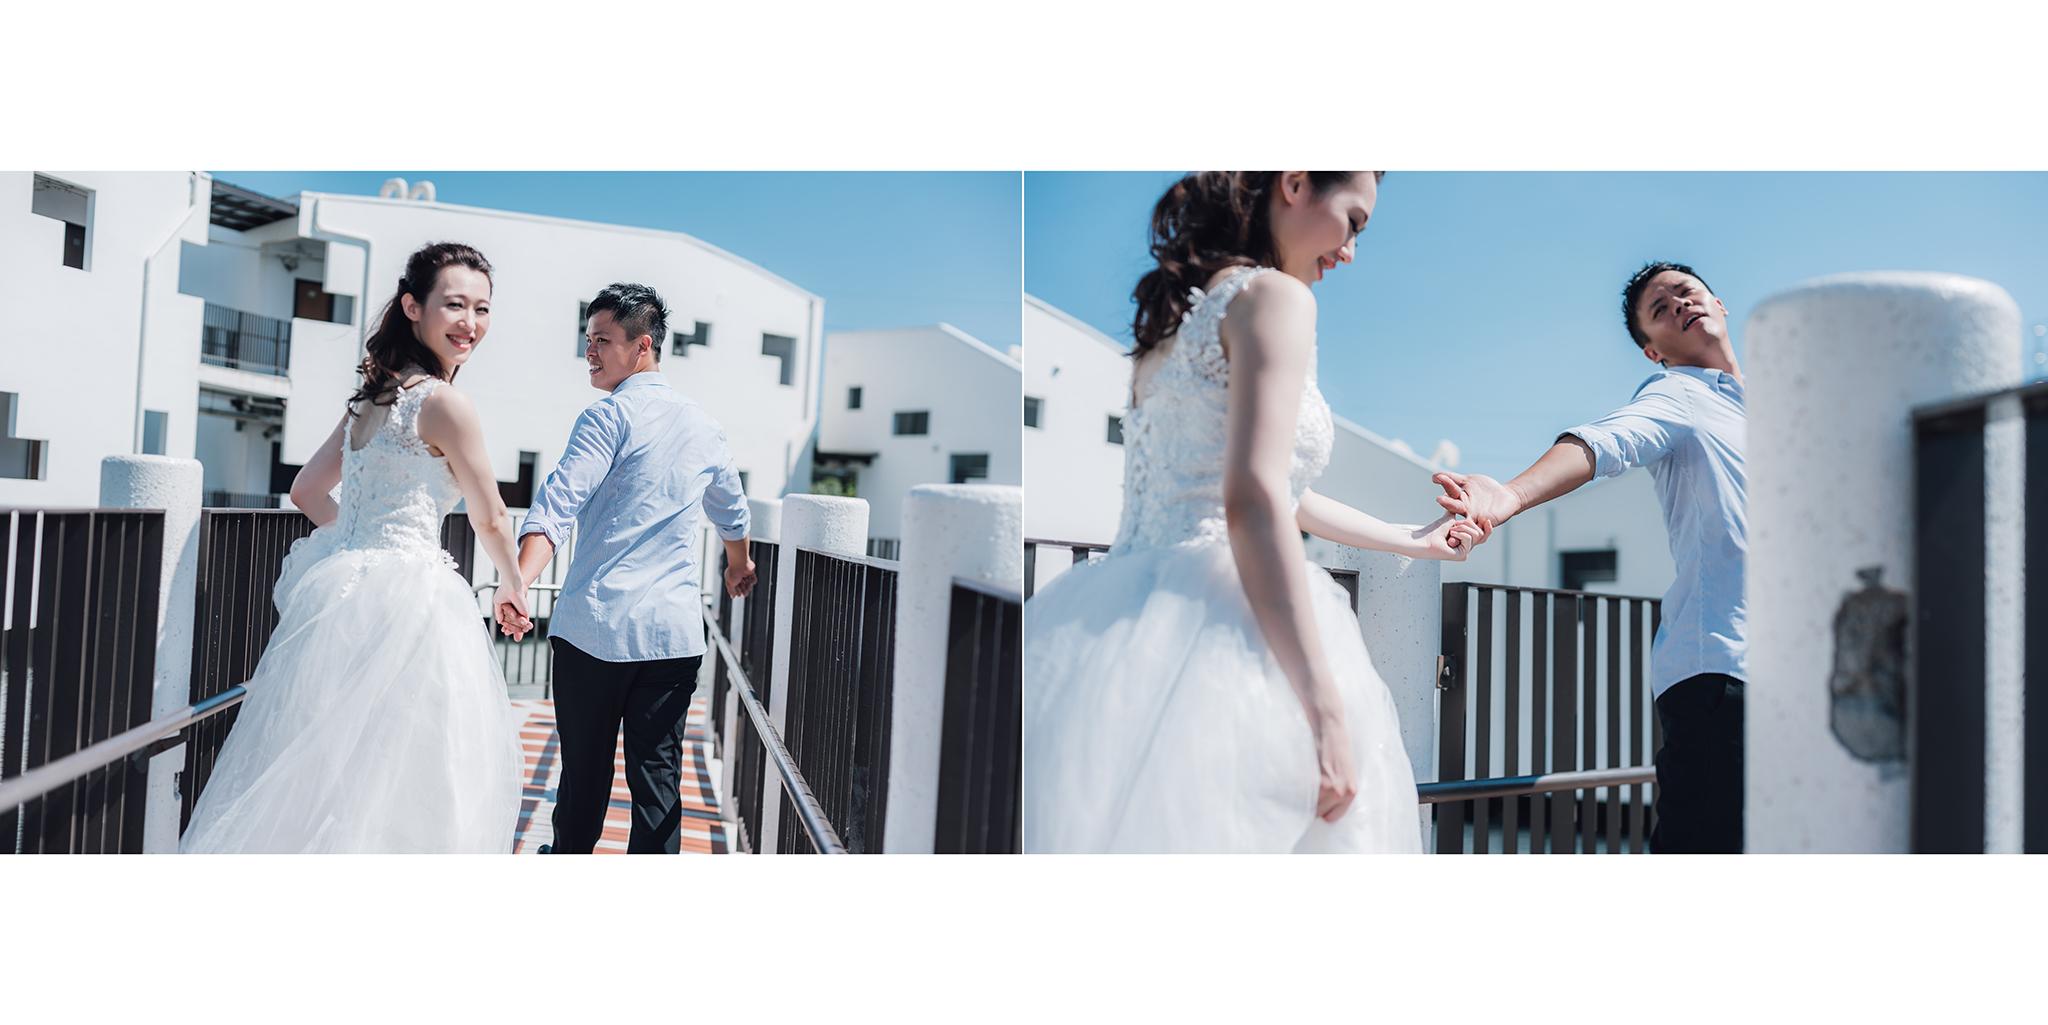 42881475075 bbb3ef67c3 o - 【自主婚紗】+儒儒&世英+